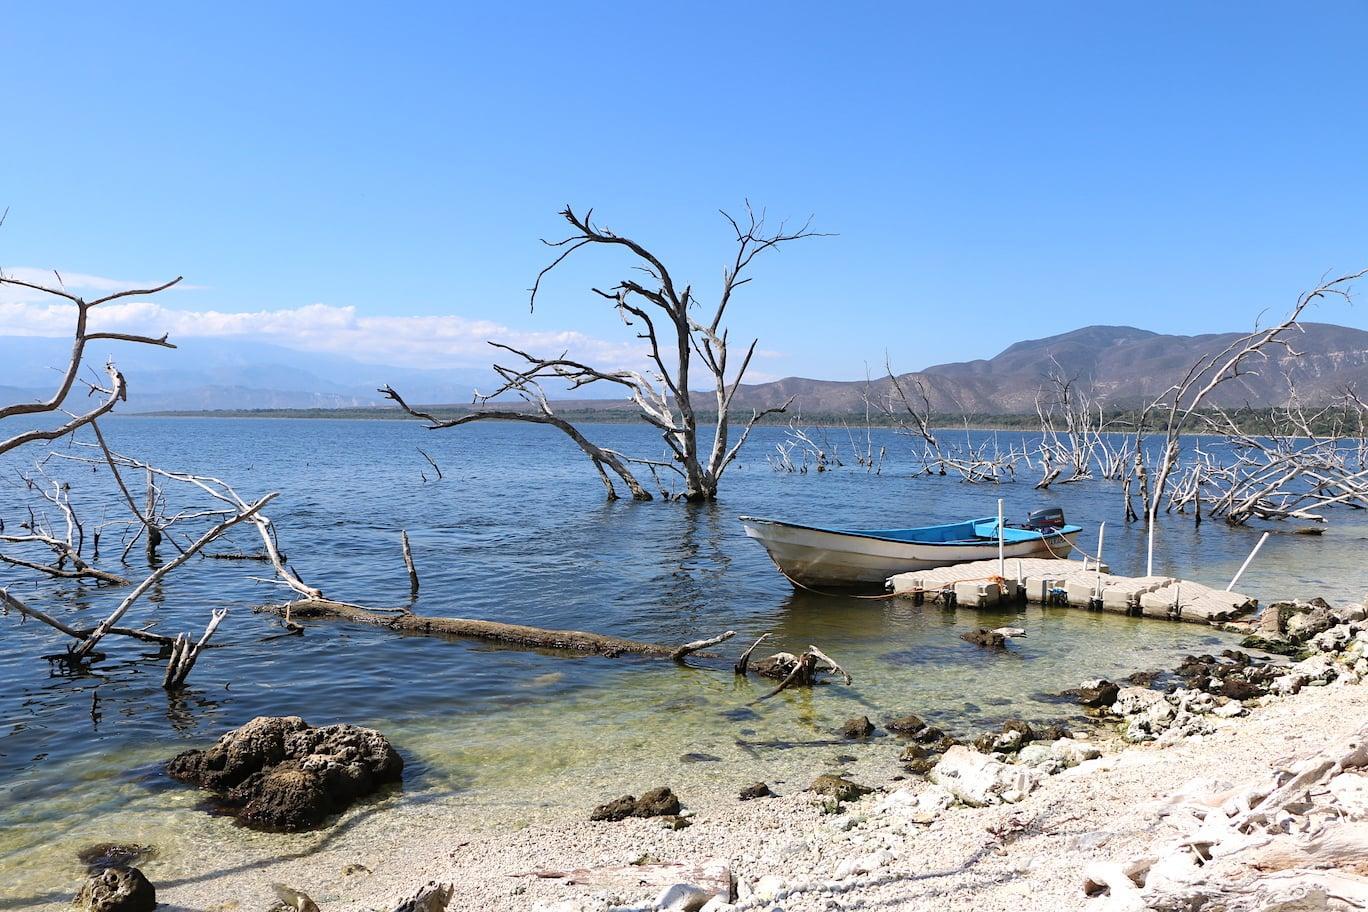 Scenery at Lake Enriquillo